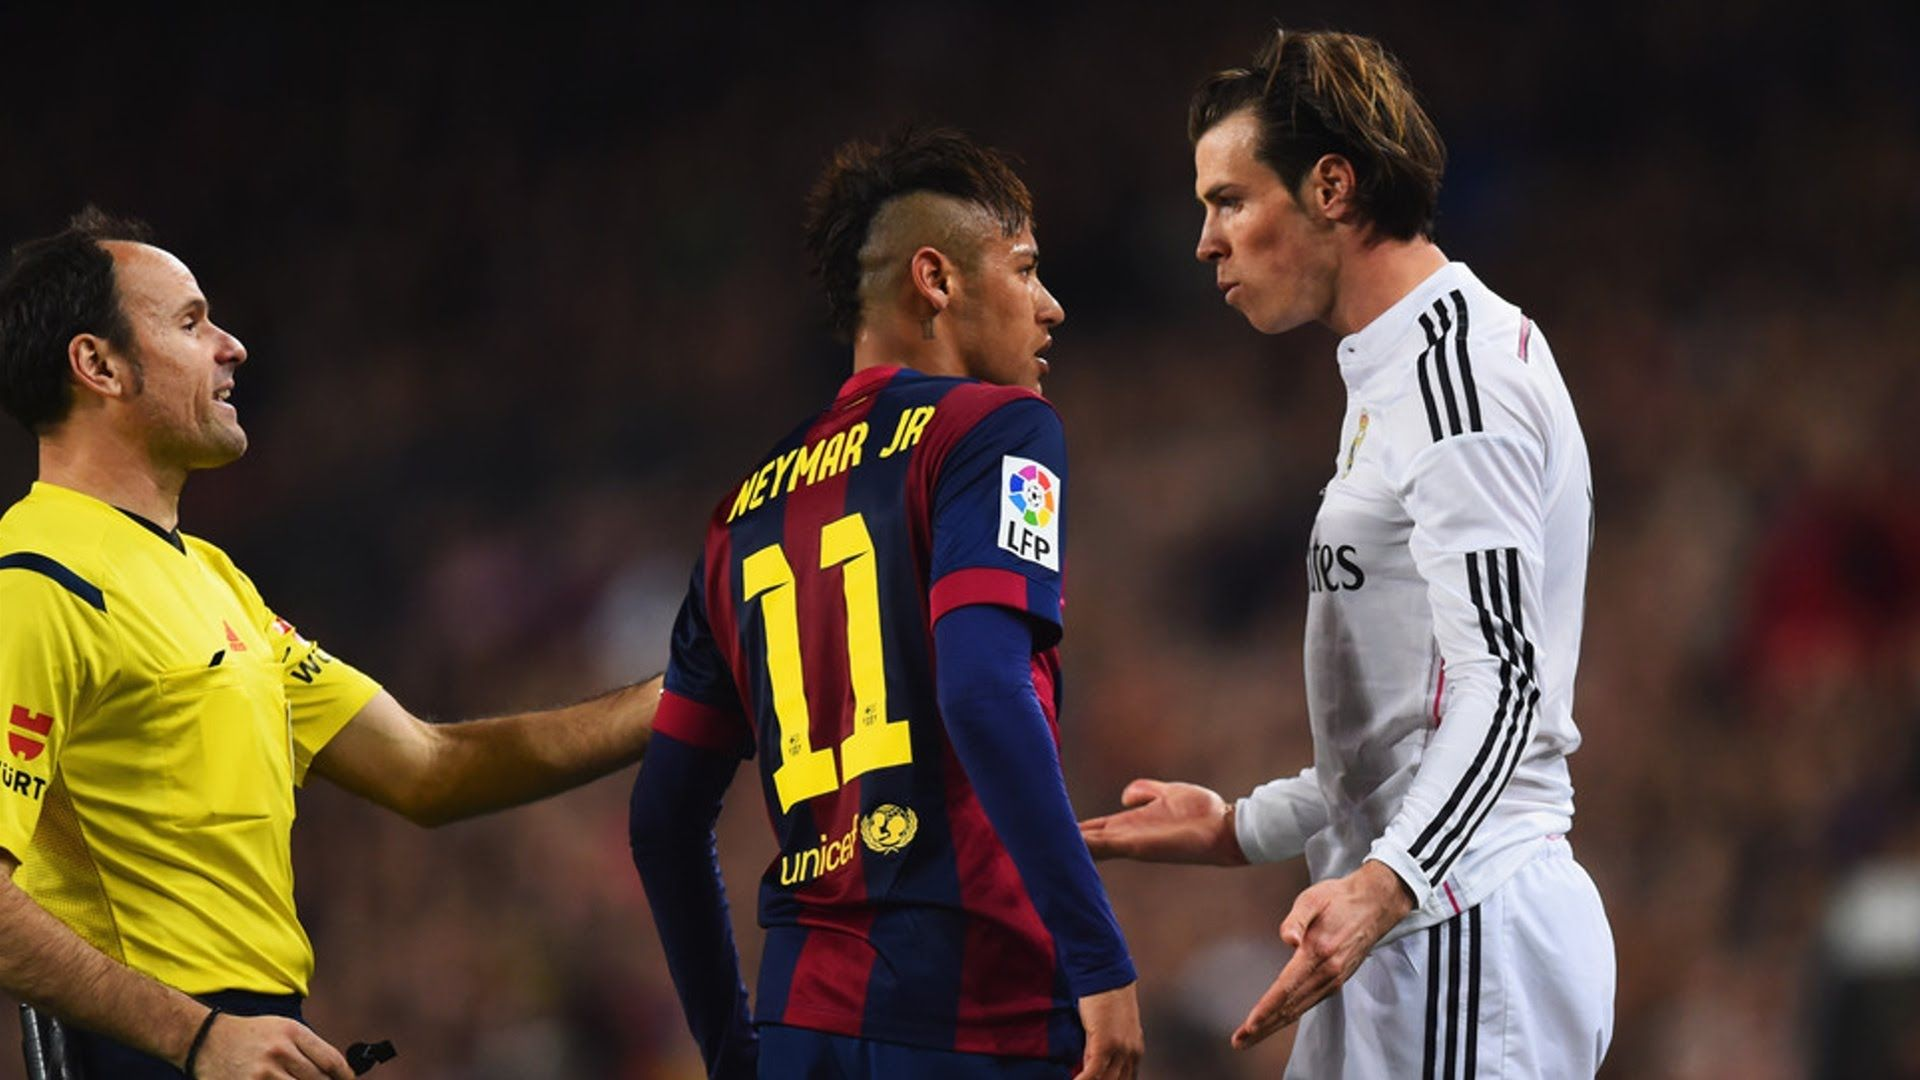 Neymar Vs Real Madrid Home Hd 1080i 22 03 2015 By Mncomps Barcelona Vs Real Madrid Real Vs Barca Real Madrid